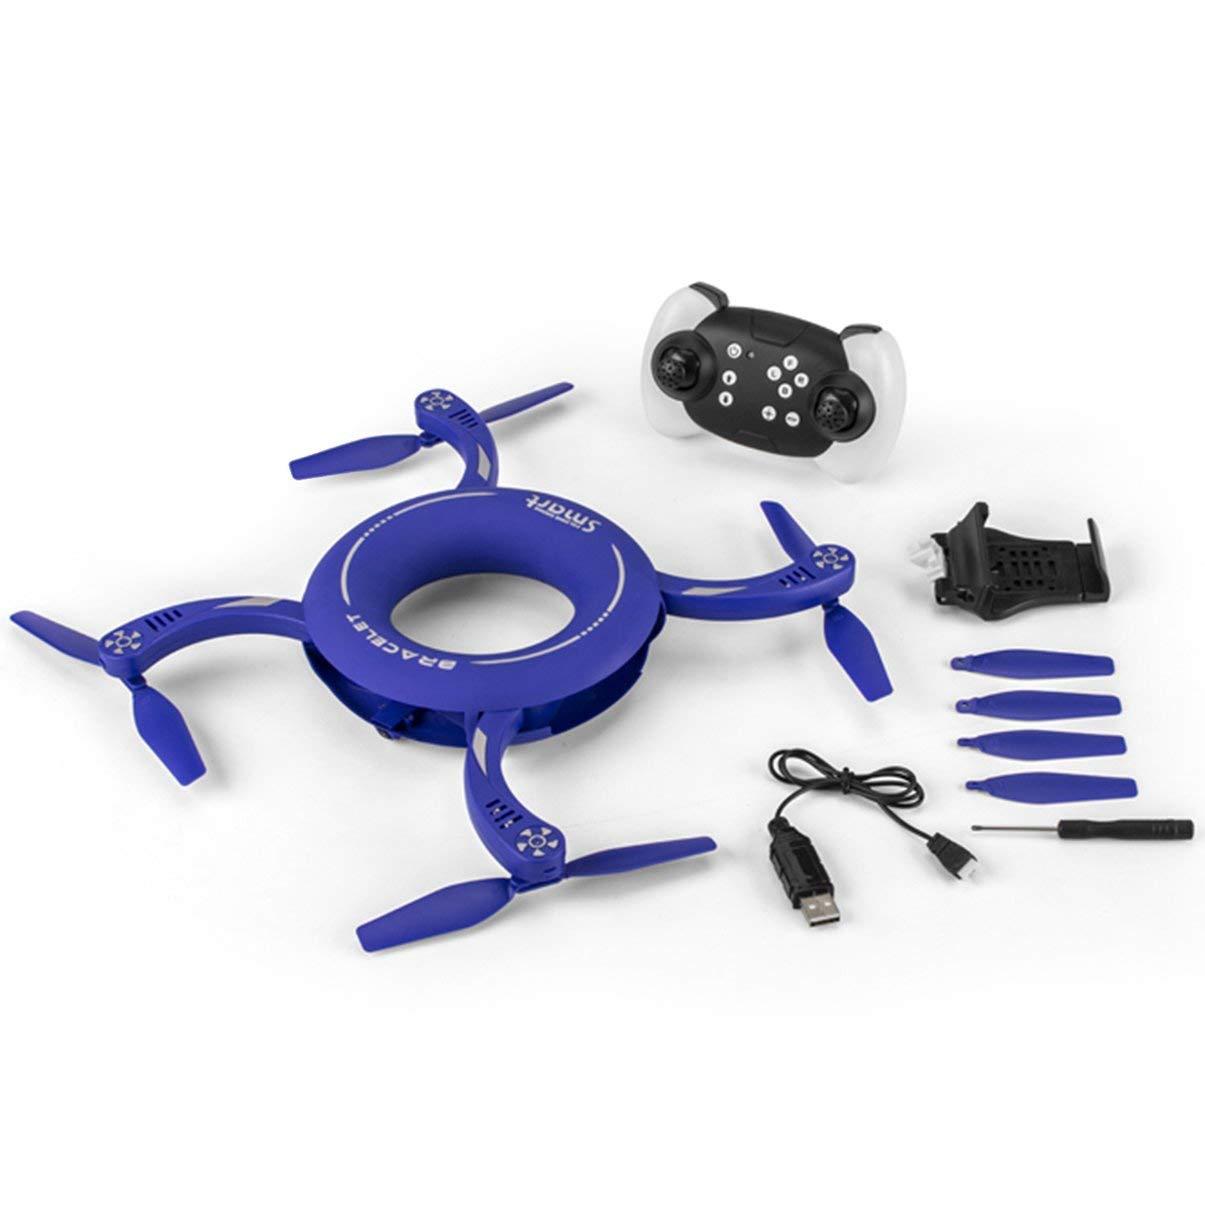 JullyeleDEgant X48 1 1 1 Kreis WiFi FPV 720p Kamera RC Drone 2.4g Falten Drehen Maß Wartung Feste Höhe Runde RC Quadcopter e823ff